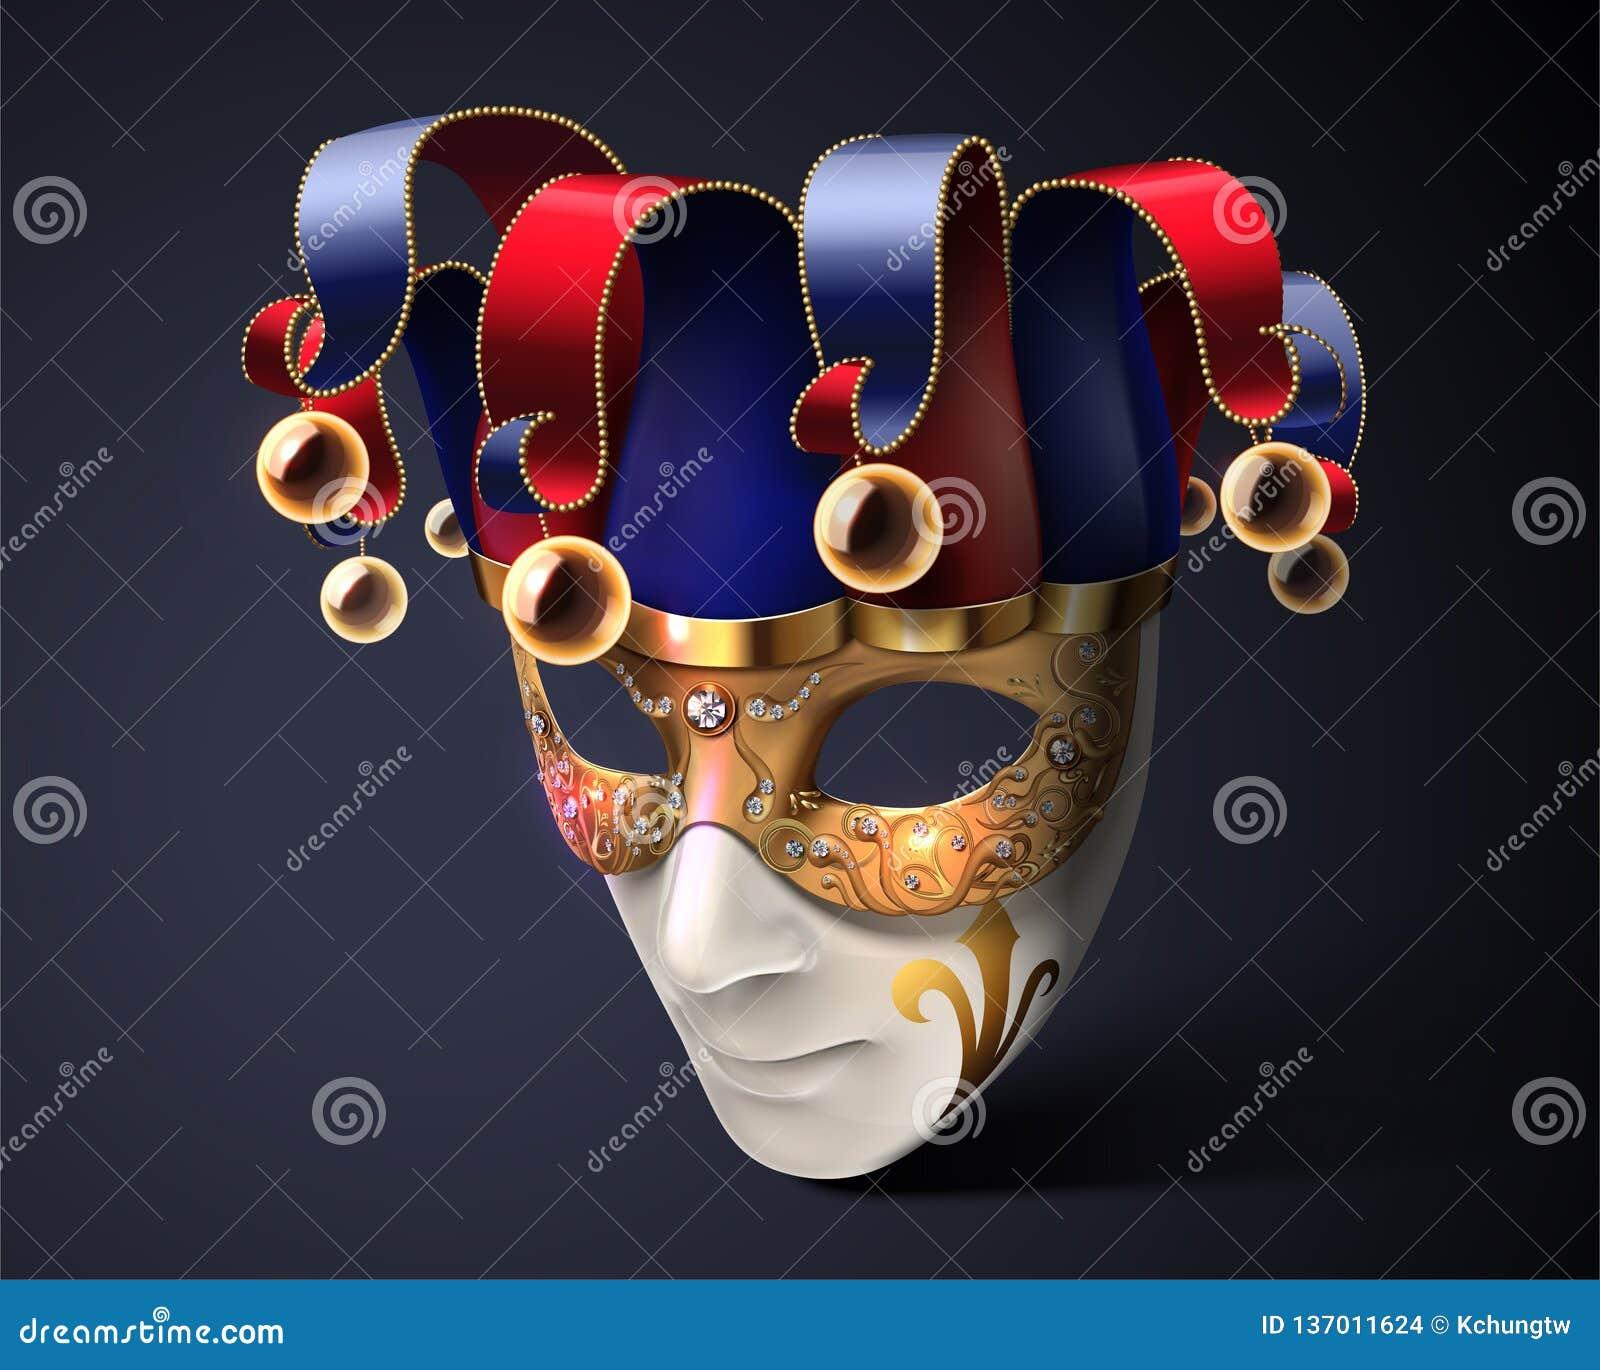 Clown mask design